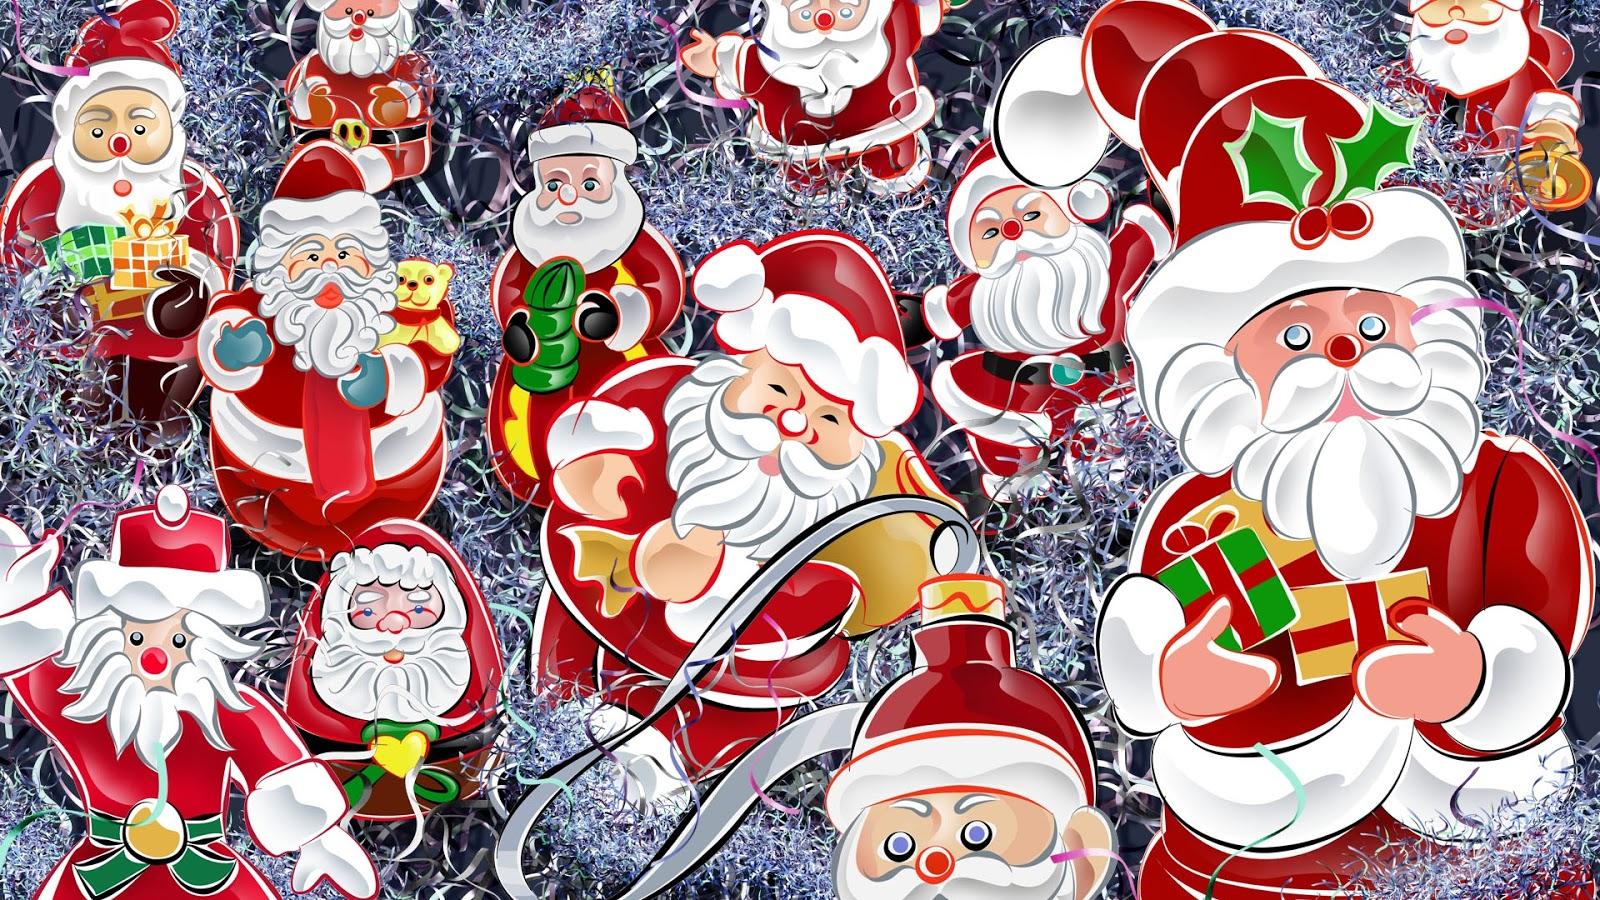 Christmas Full HD Wallpapers 1080p